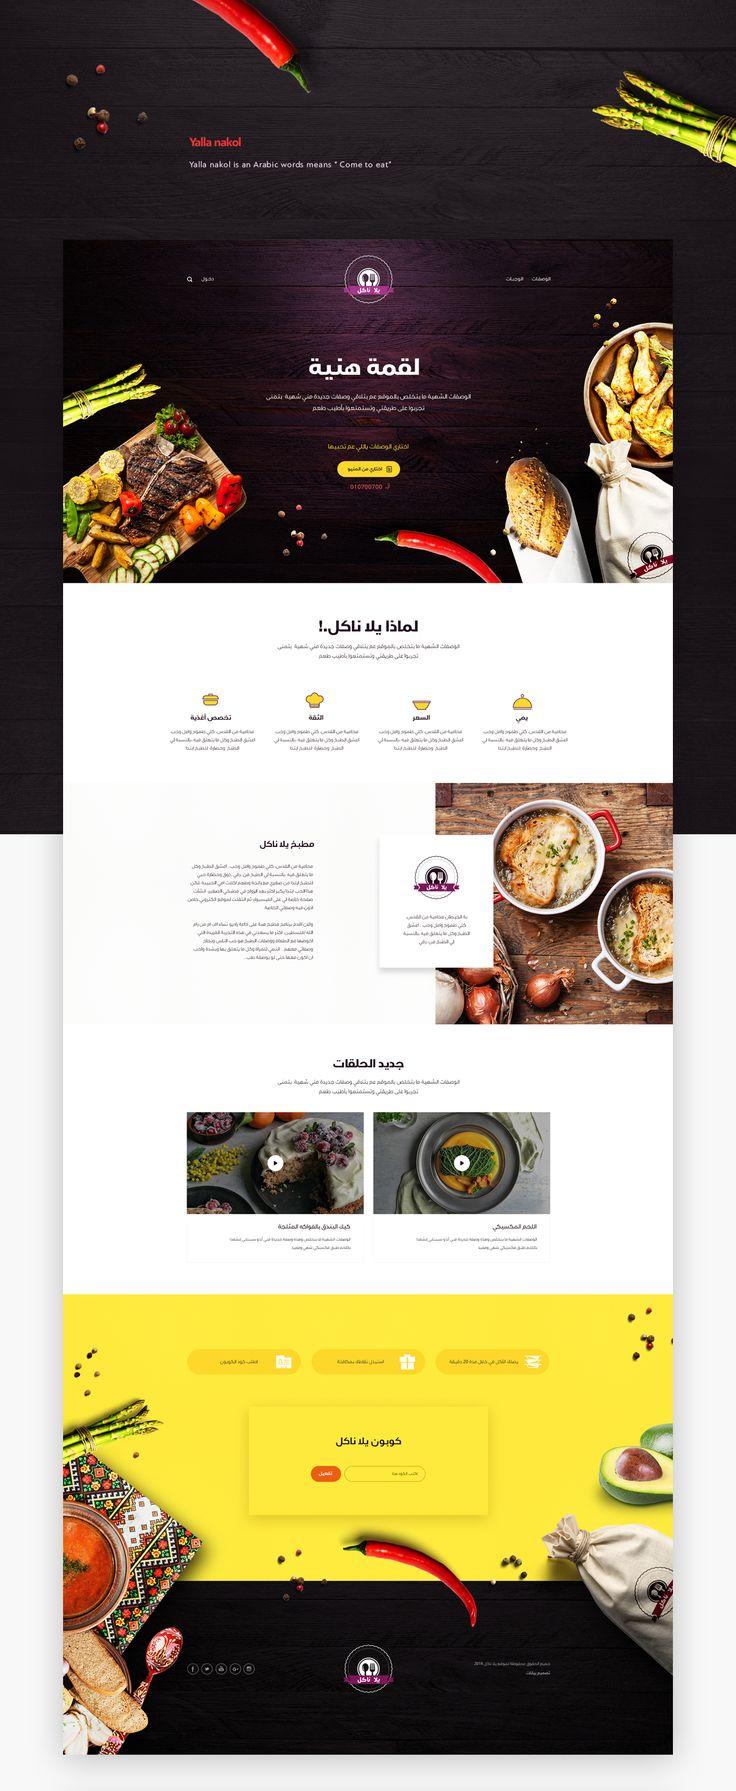 Yalla nakol web design UX/UI on Behance